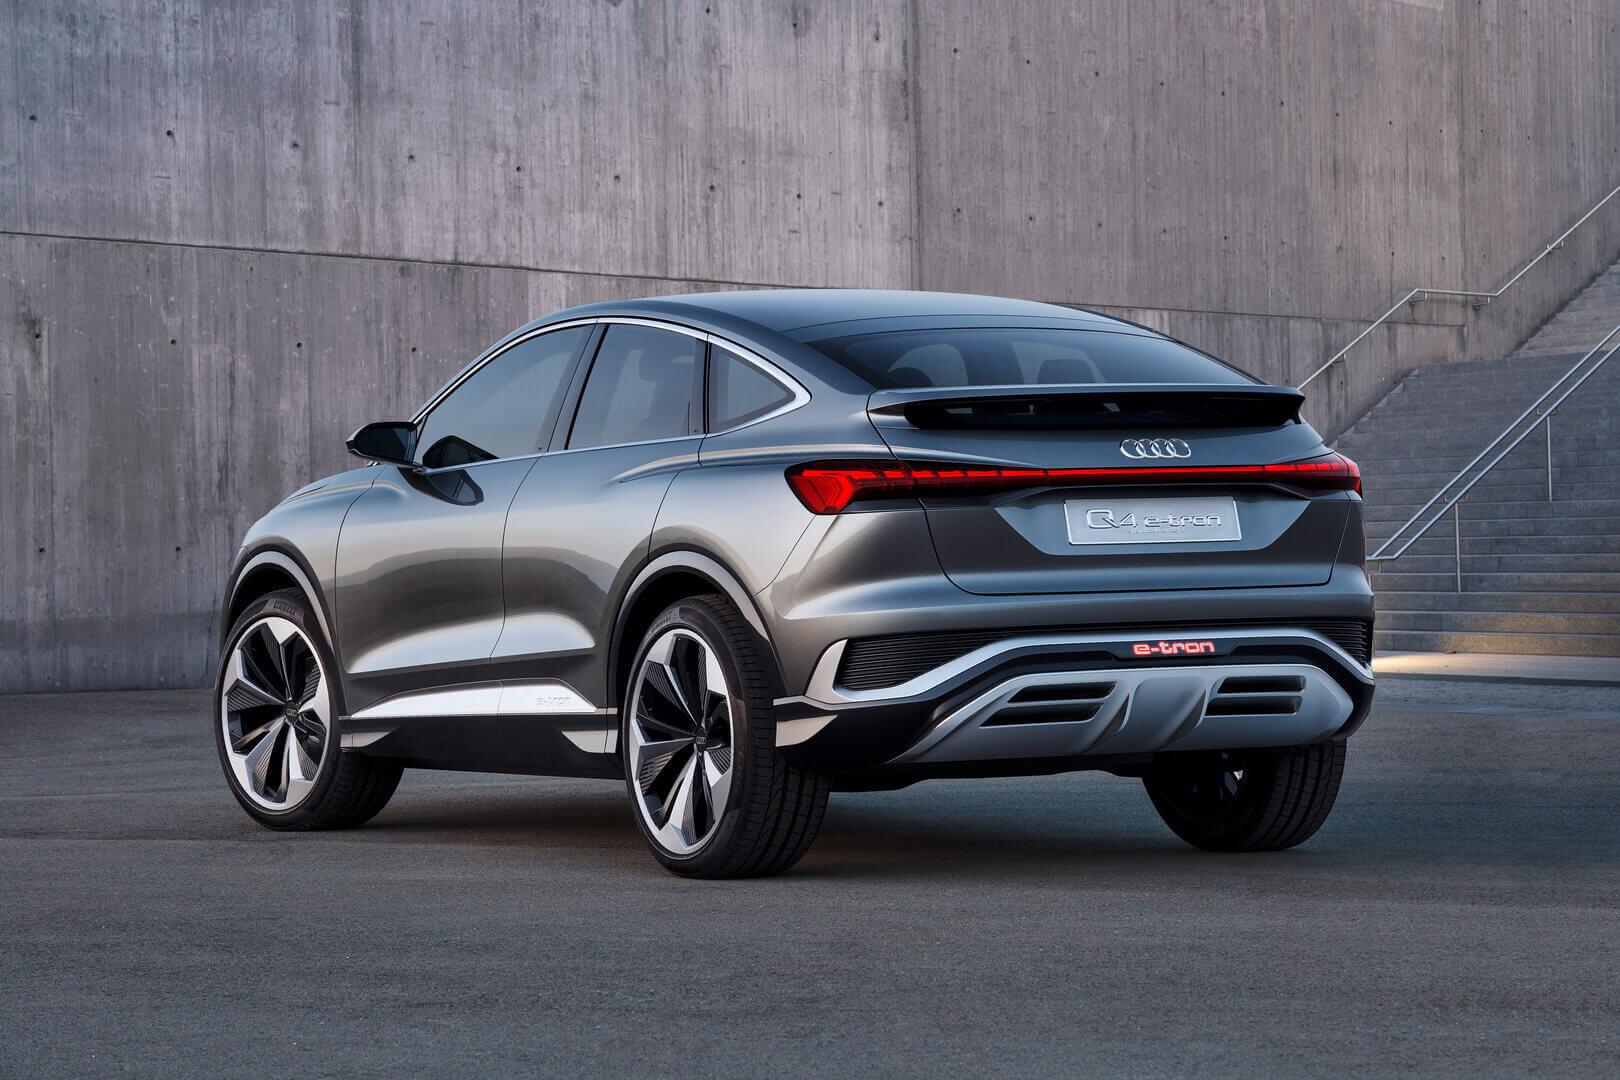 Audi представляет концепт электрического купе-кроссовера Q4 Sportsback e-tron